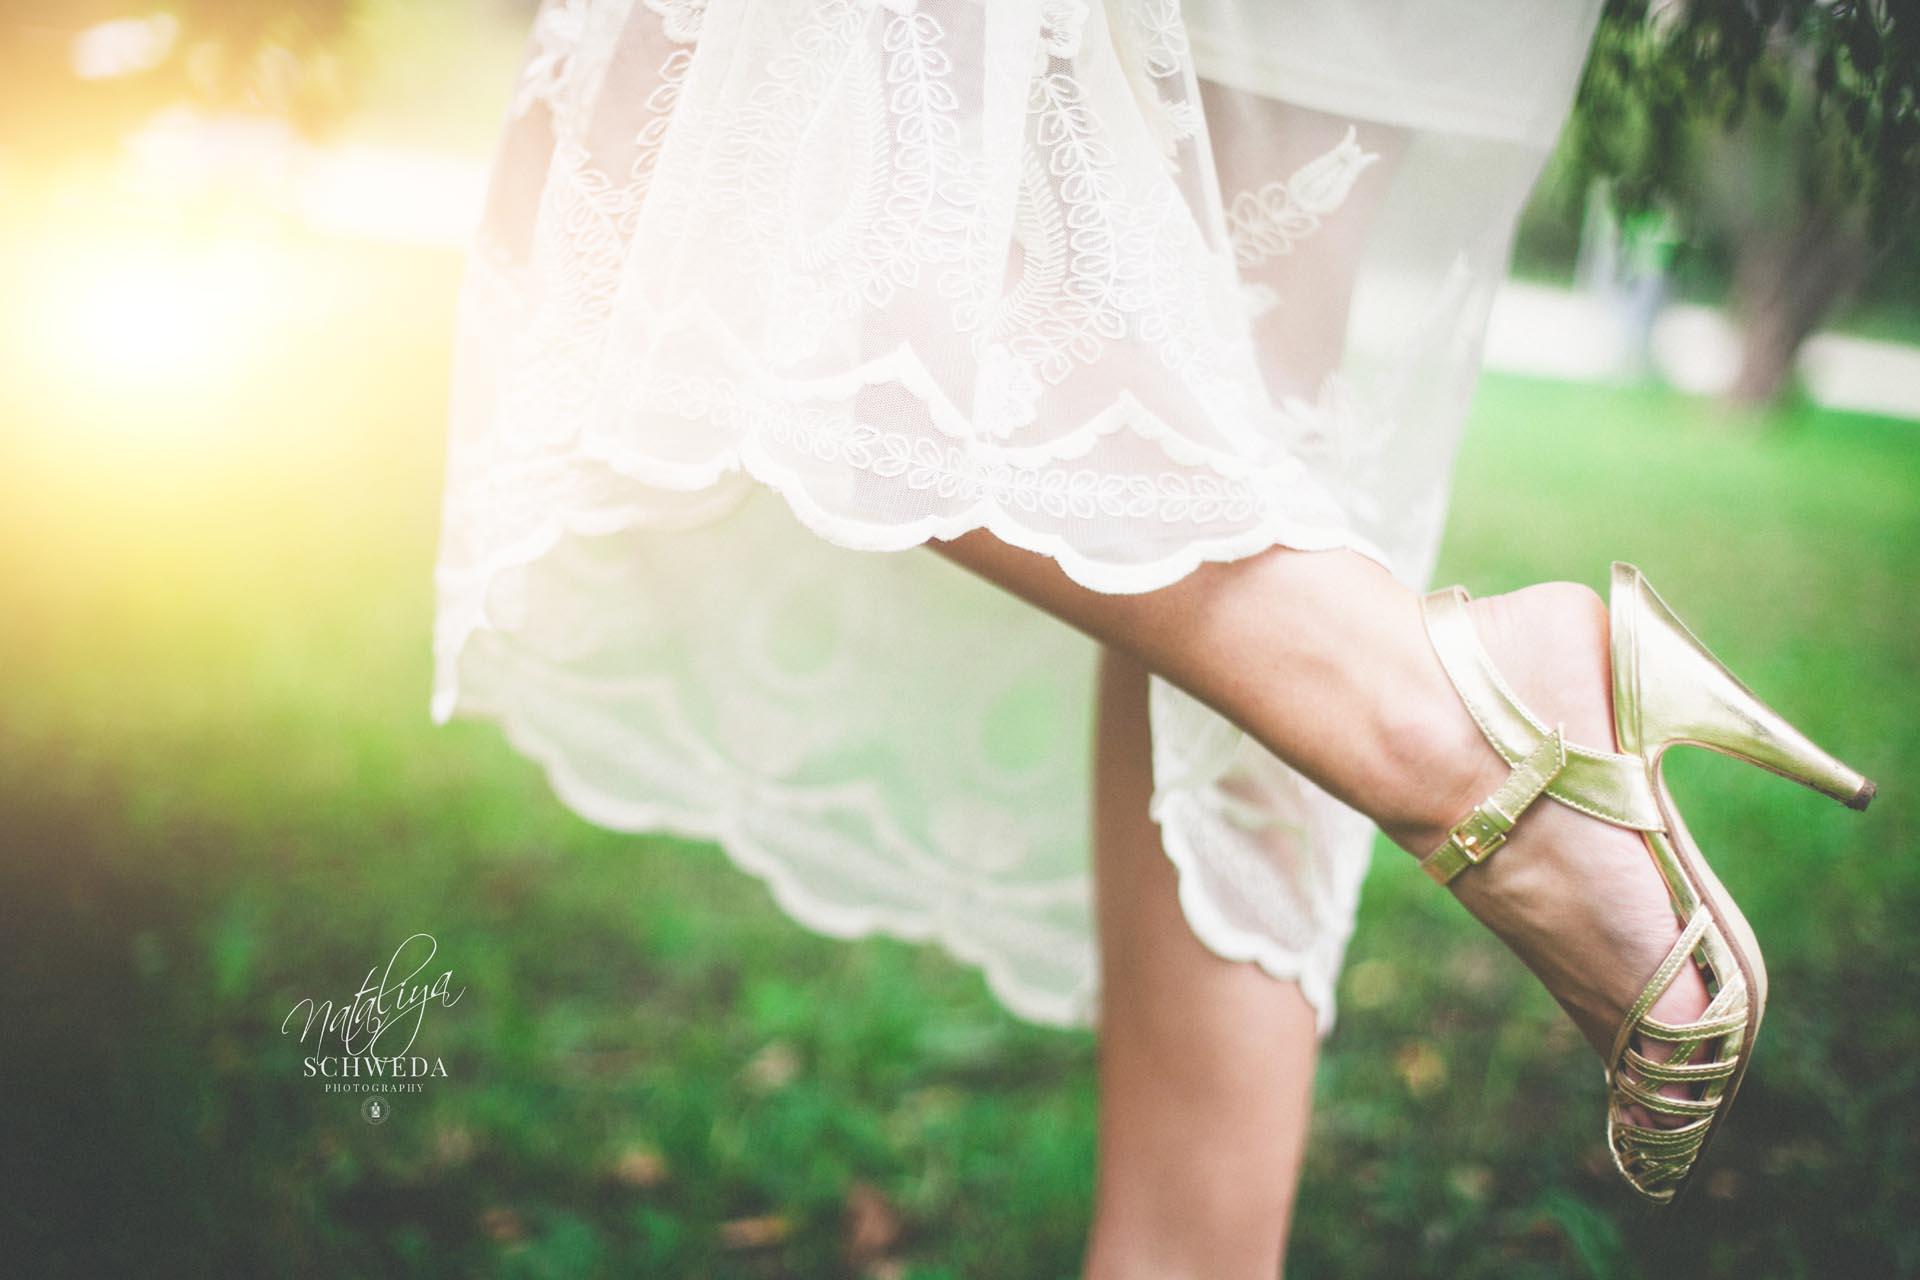 Fine Art Hochzeitsfotograf Nataliya Schweda